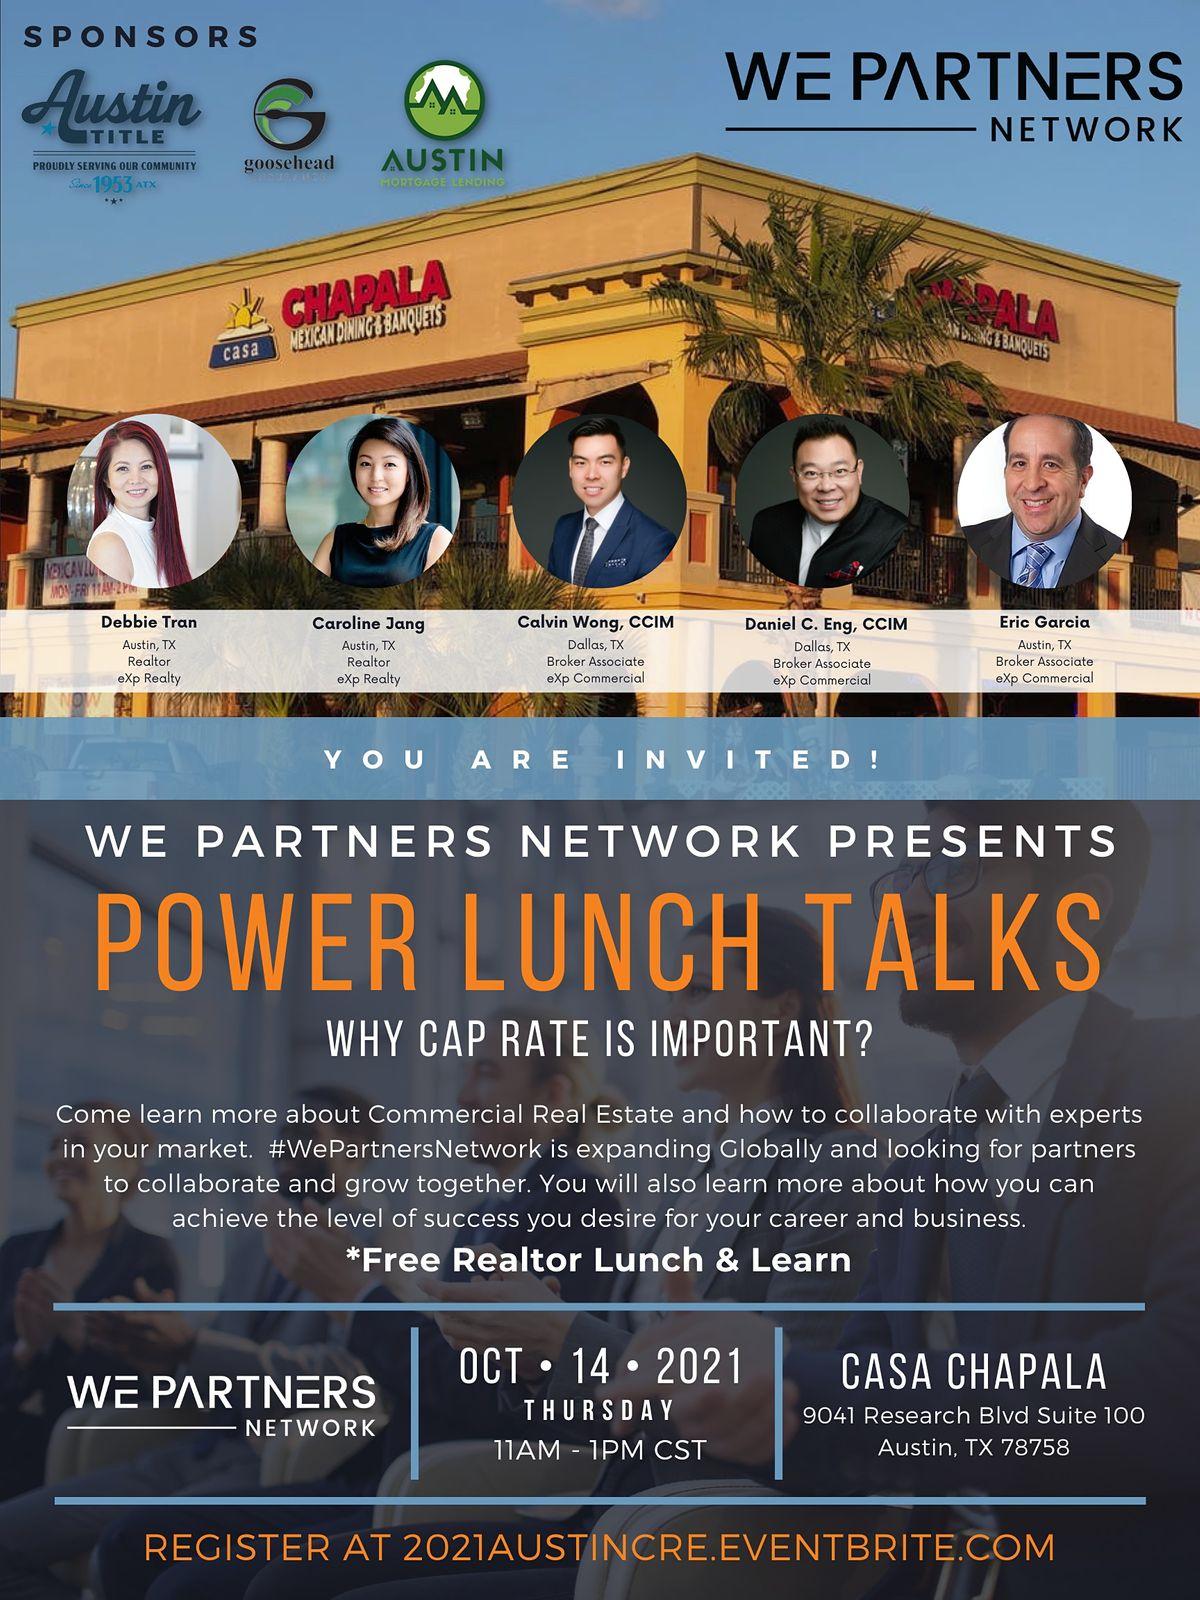 Power Lunch Talks - Realtors Meet and Greet   Casa Chapala Austin, TX